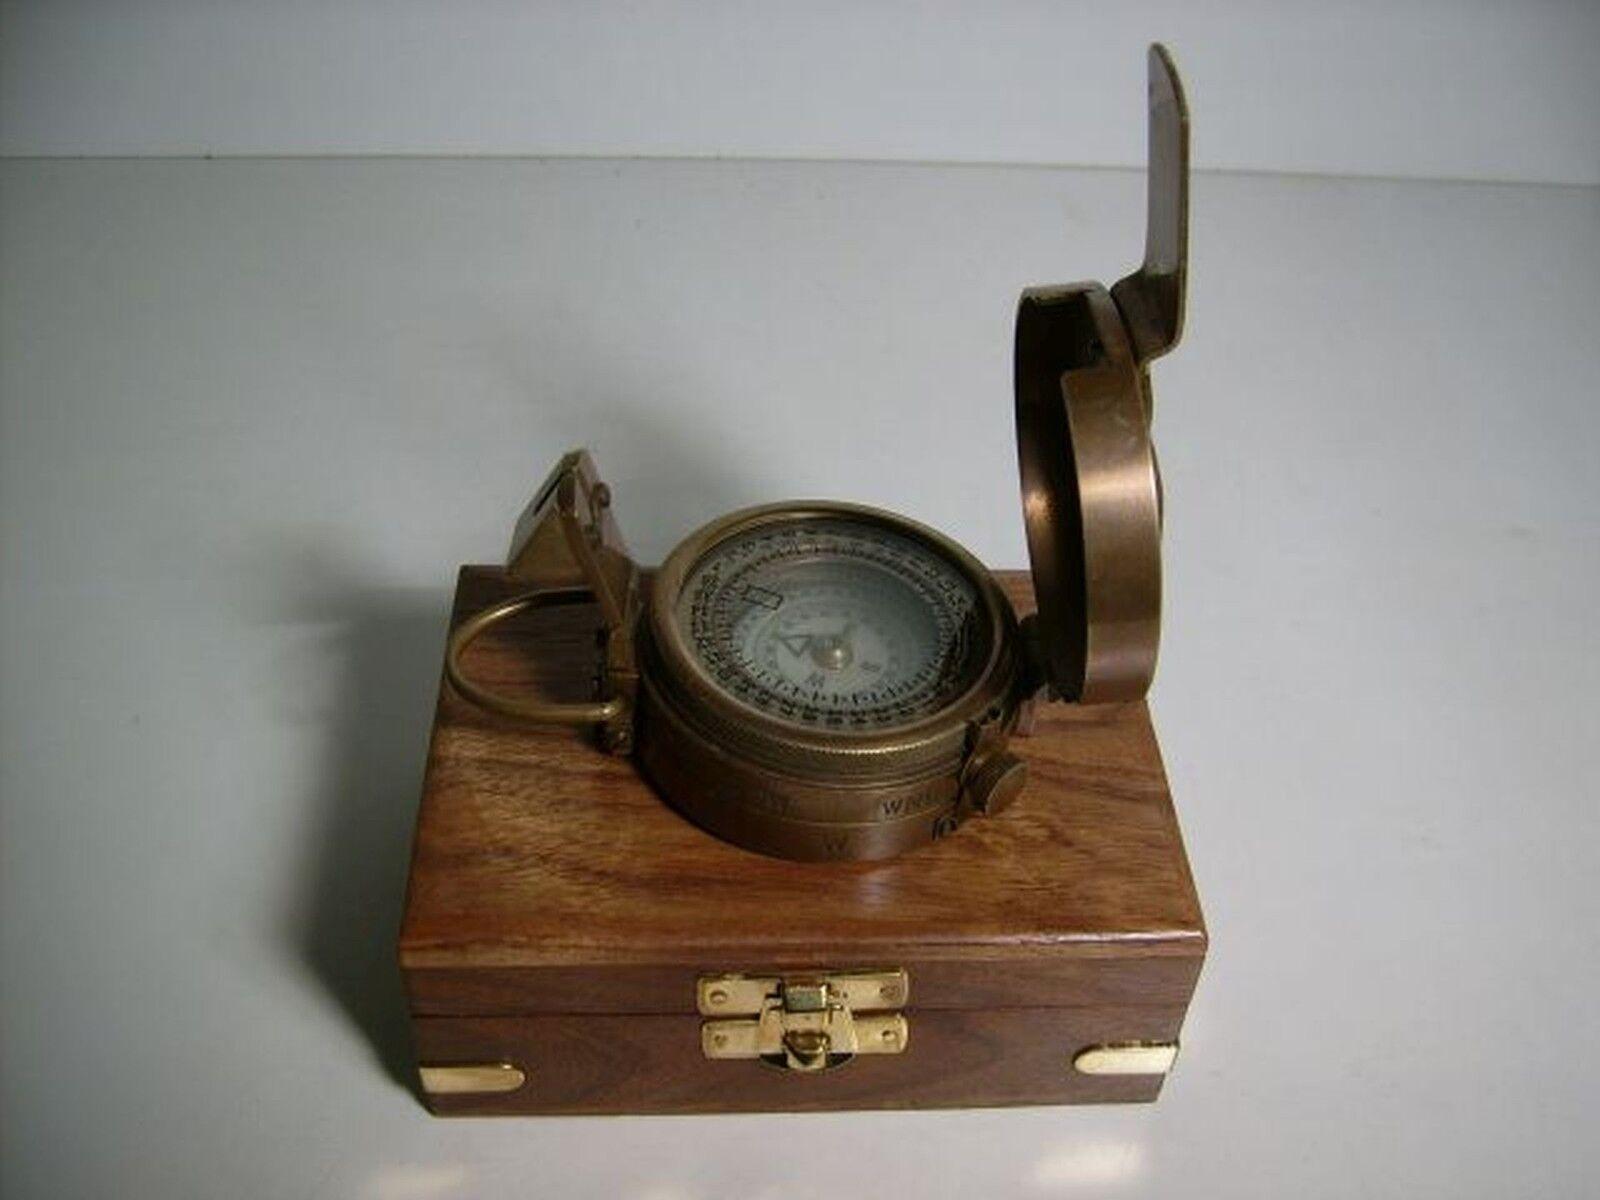 Peilkompass, coffret, orientation, abenteuerer, navigateur, marcheurs, marcheurs, marcheurs, décoration aa3eda